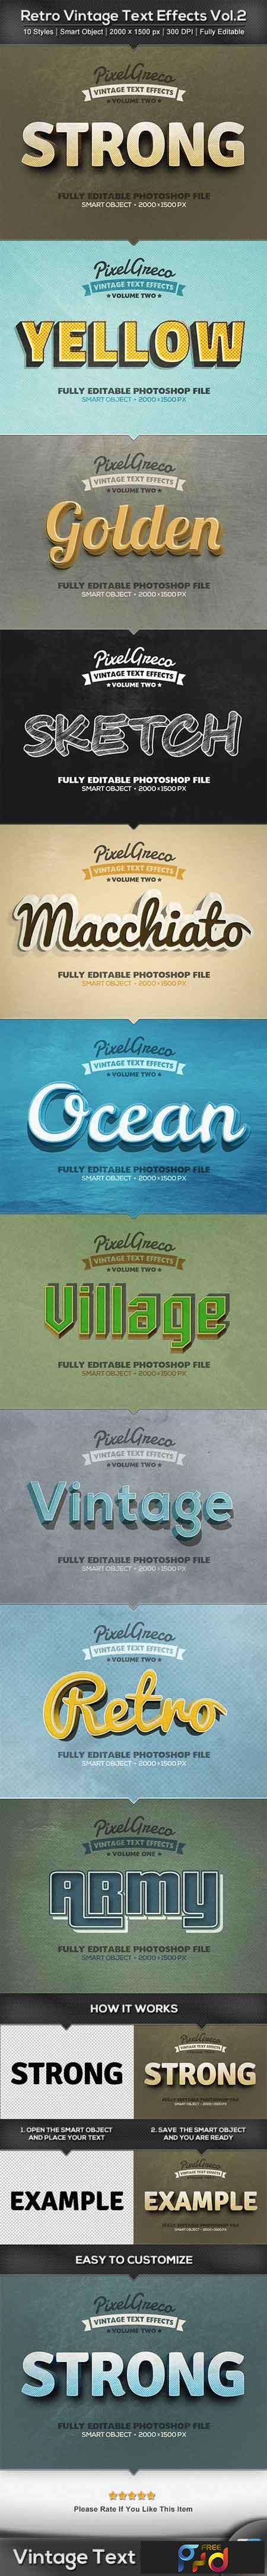 Retro Vintage Text Effects Vol2 22891278 - FreePSDvn